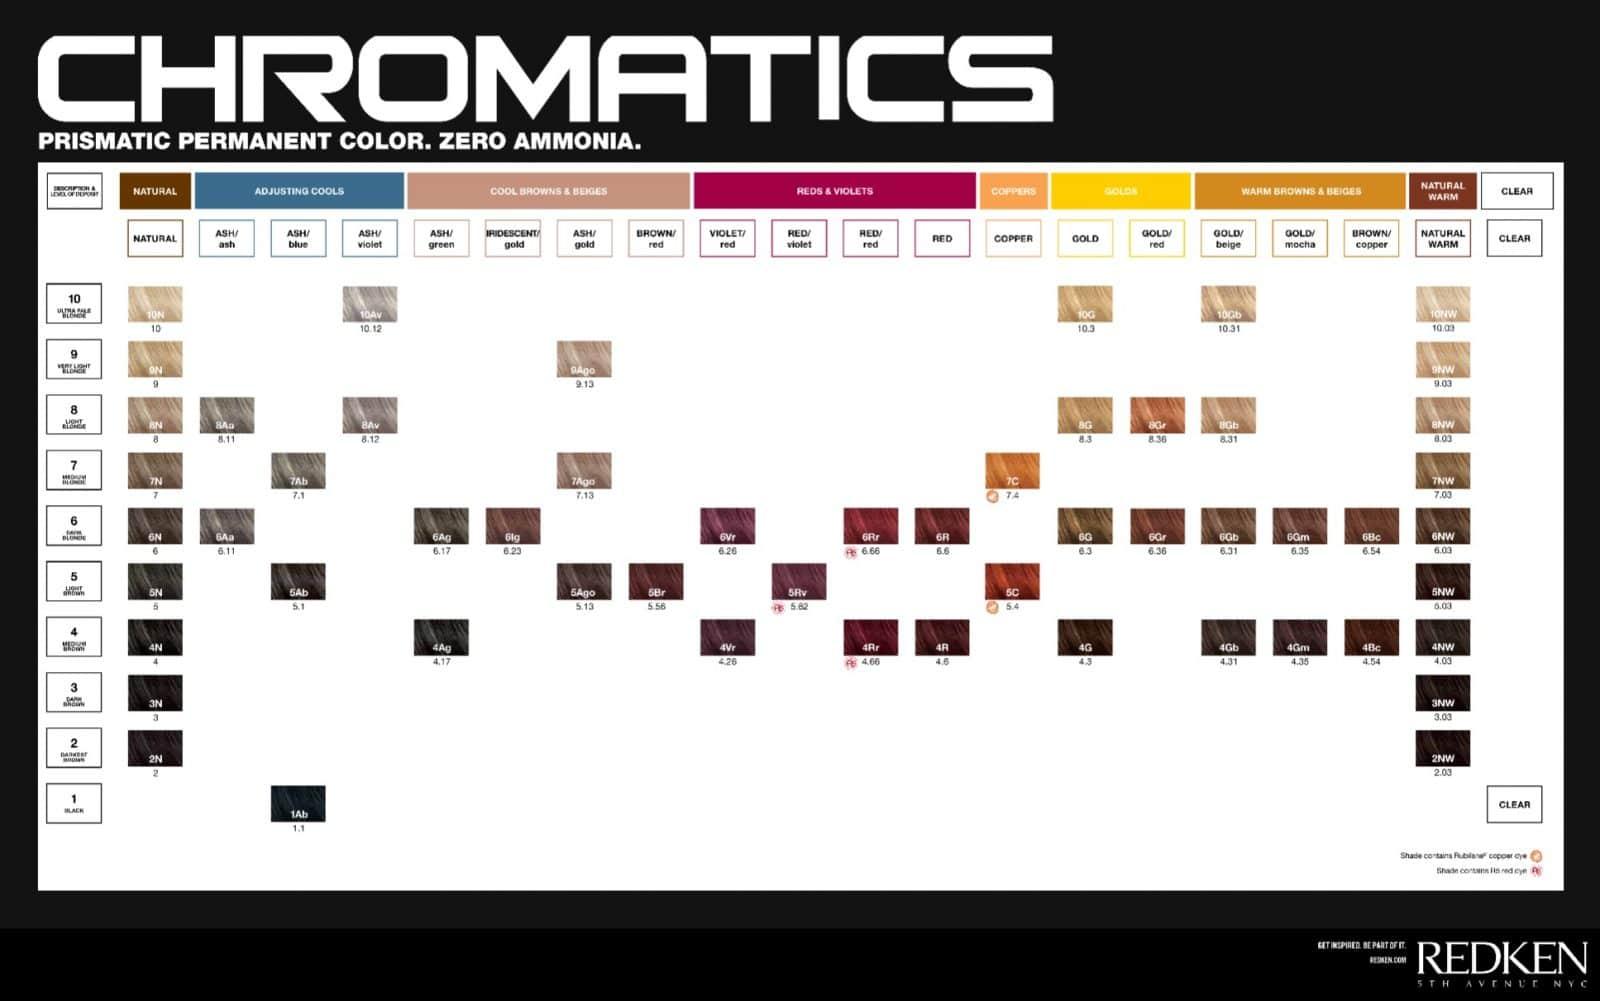 REDKEN CHROMATICS CHART